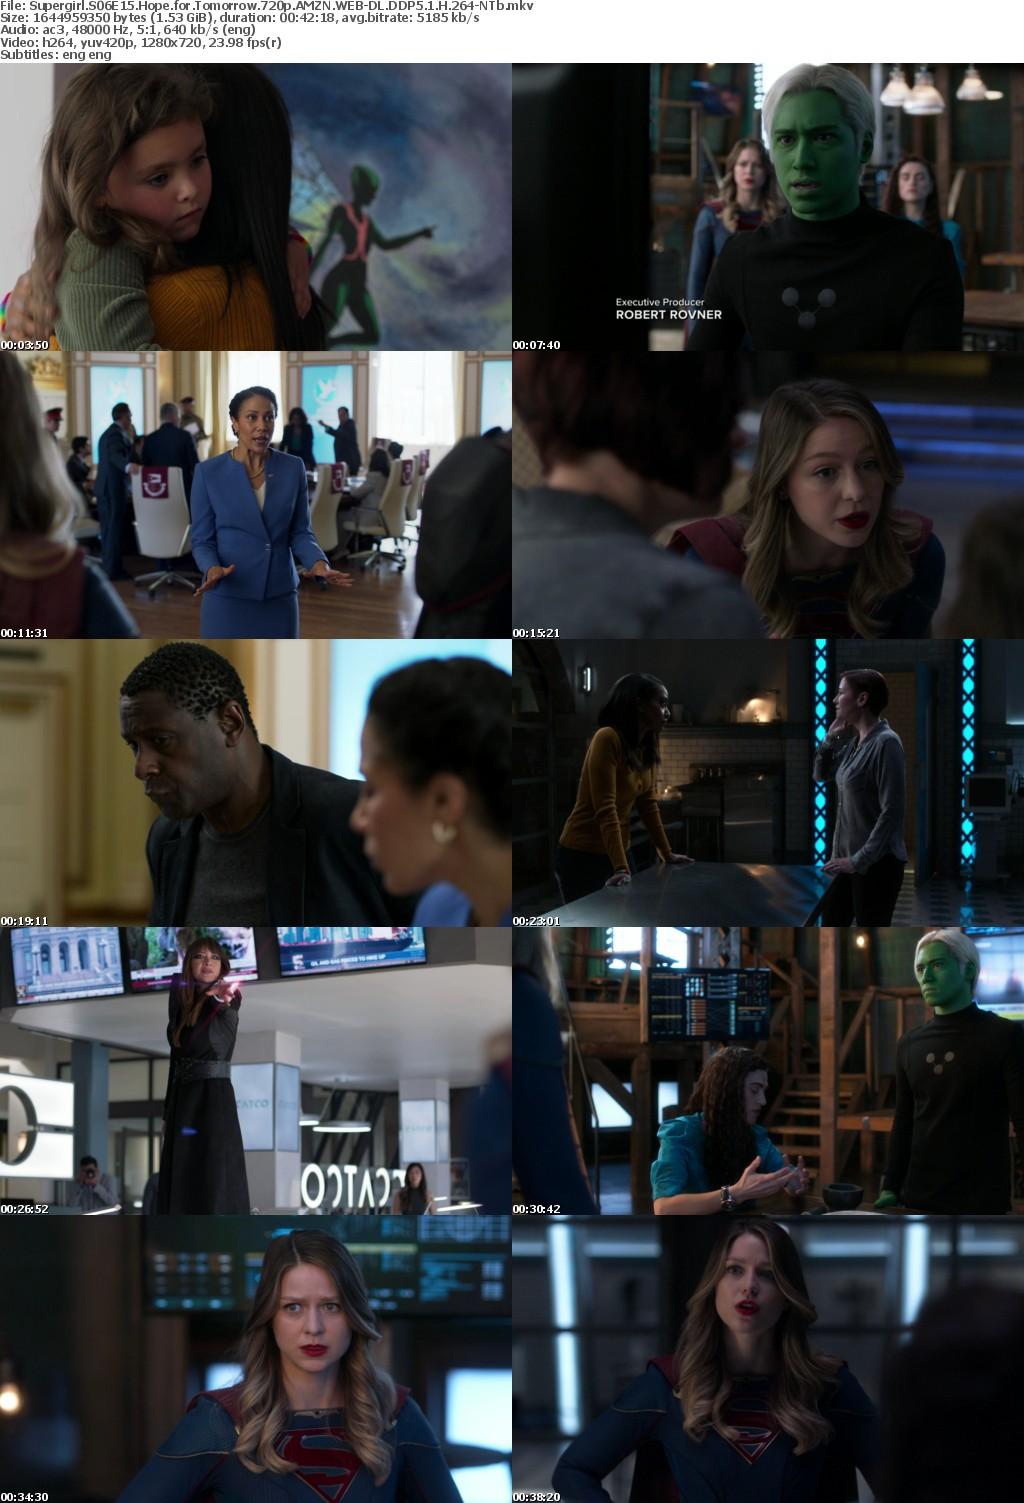 Supergirl S06E15 Hope for Tomorrow 720p AMZN WEBRip DDP5 1 x264-NTb